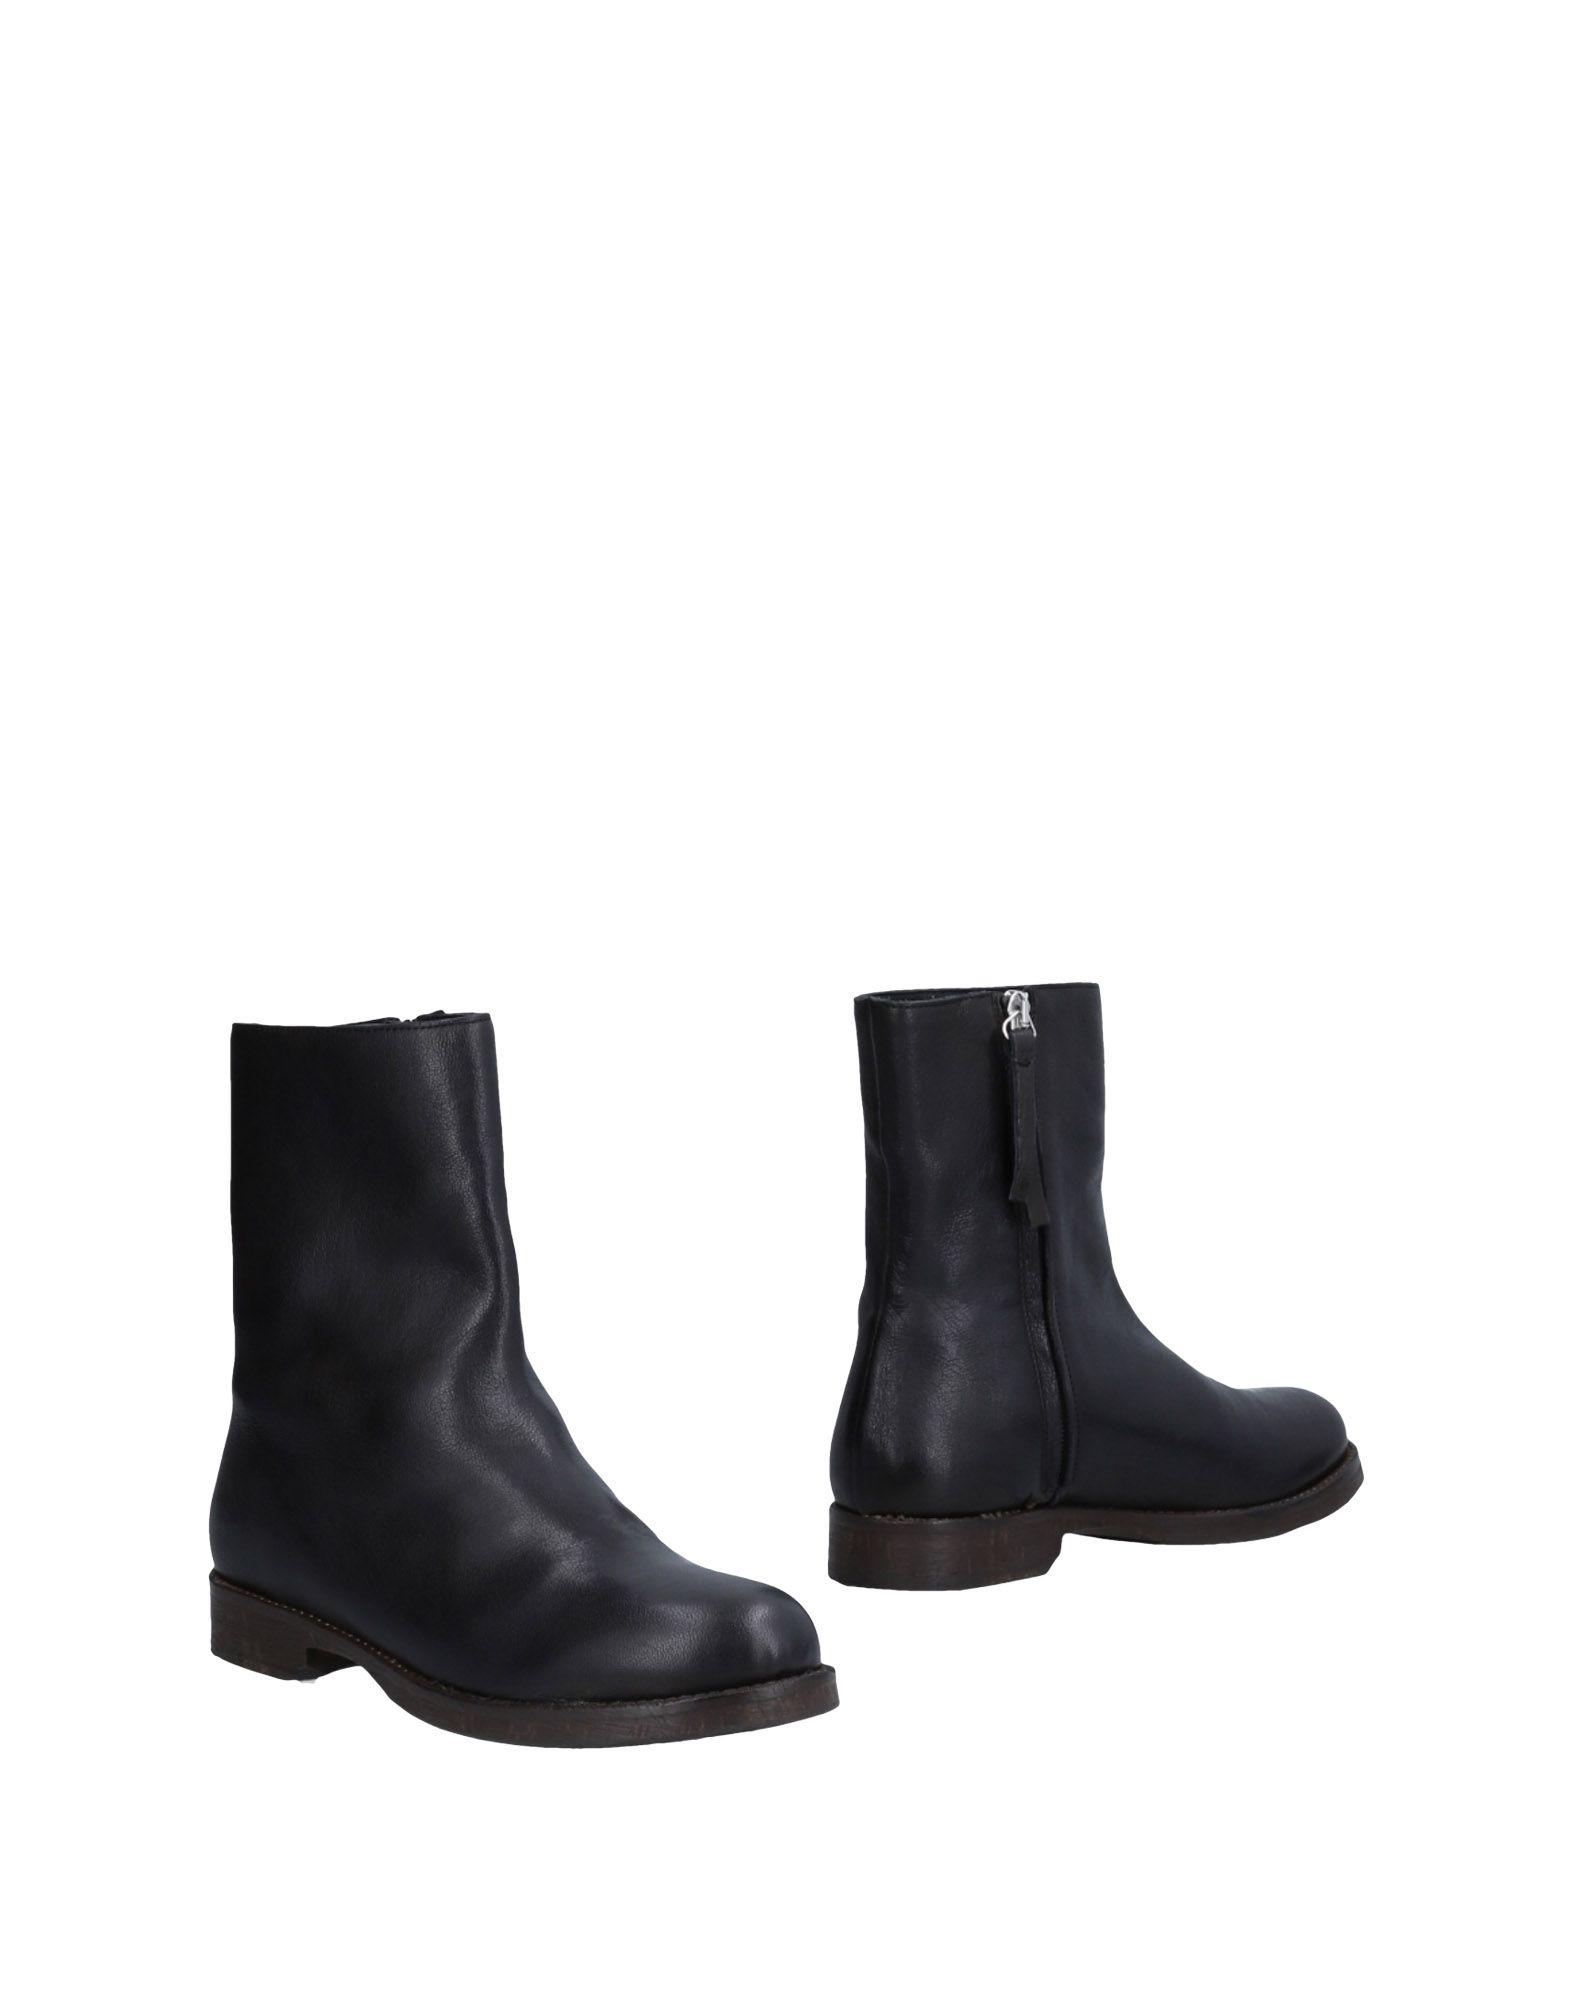 LUCA VALENTINI Полусапоги и высокие ботинки ботинки дерби из кожи tomina luca